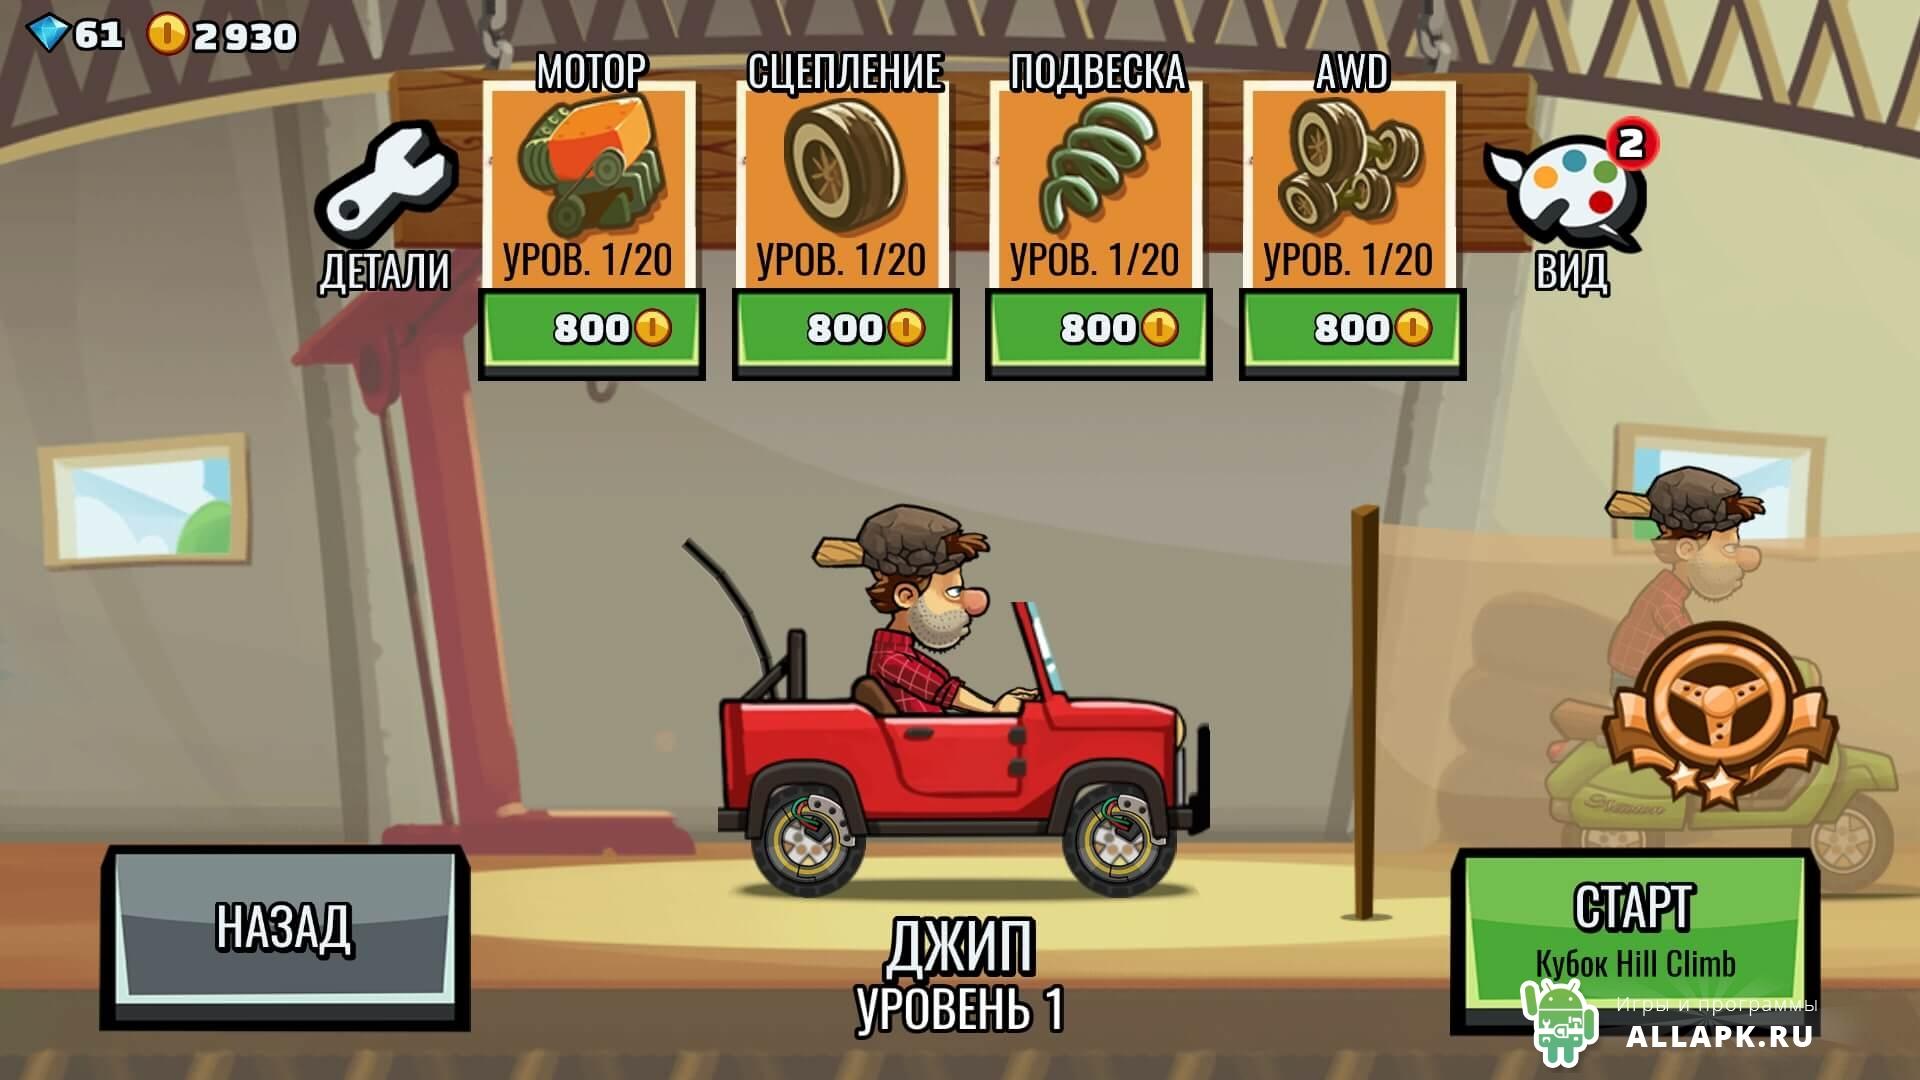 скачать игру на андроид hill climb racing мод много денег на андроид